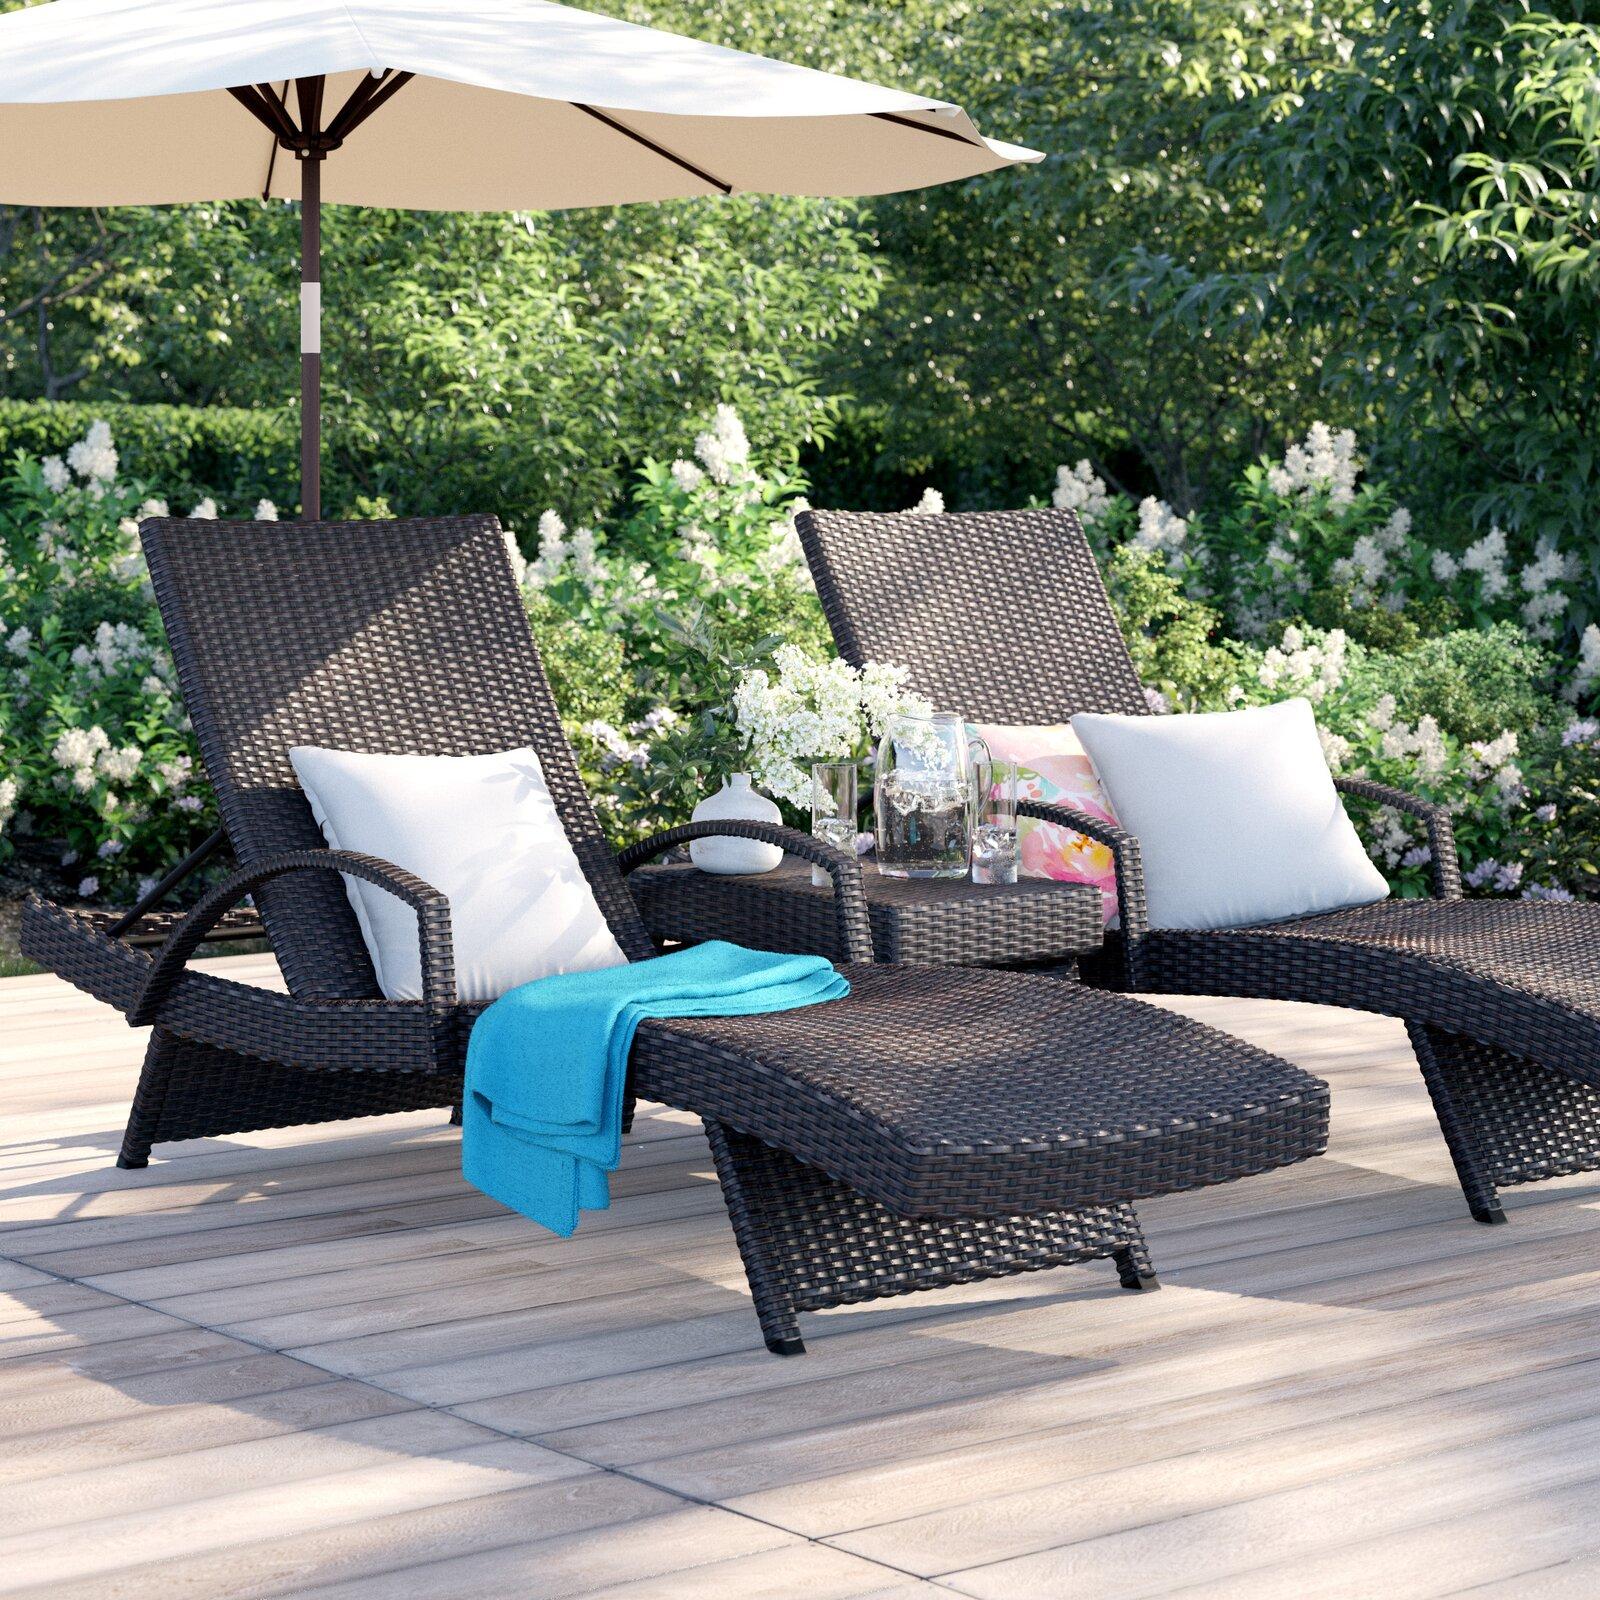 Robello Chaise Lounge Chair Outdoor